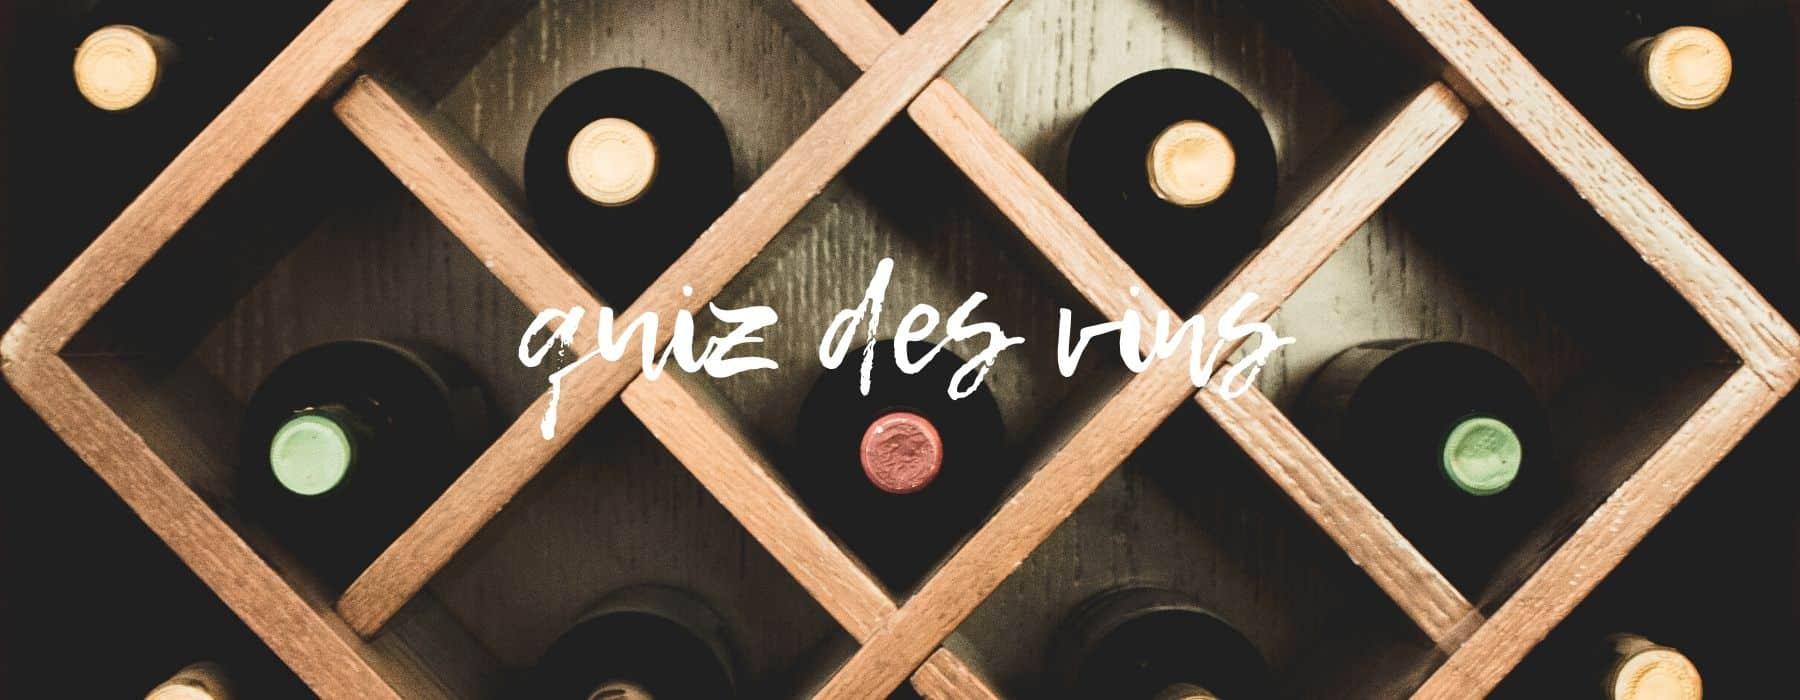 TEAM BUILDING atelier quiz des vins